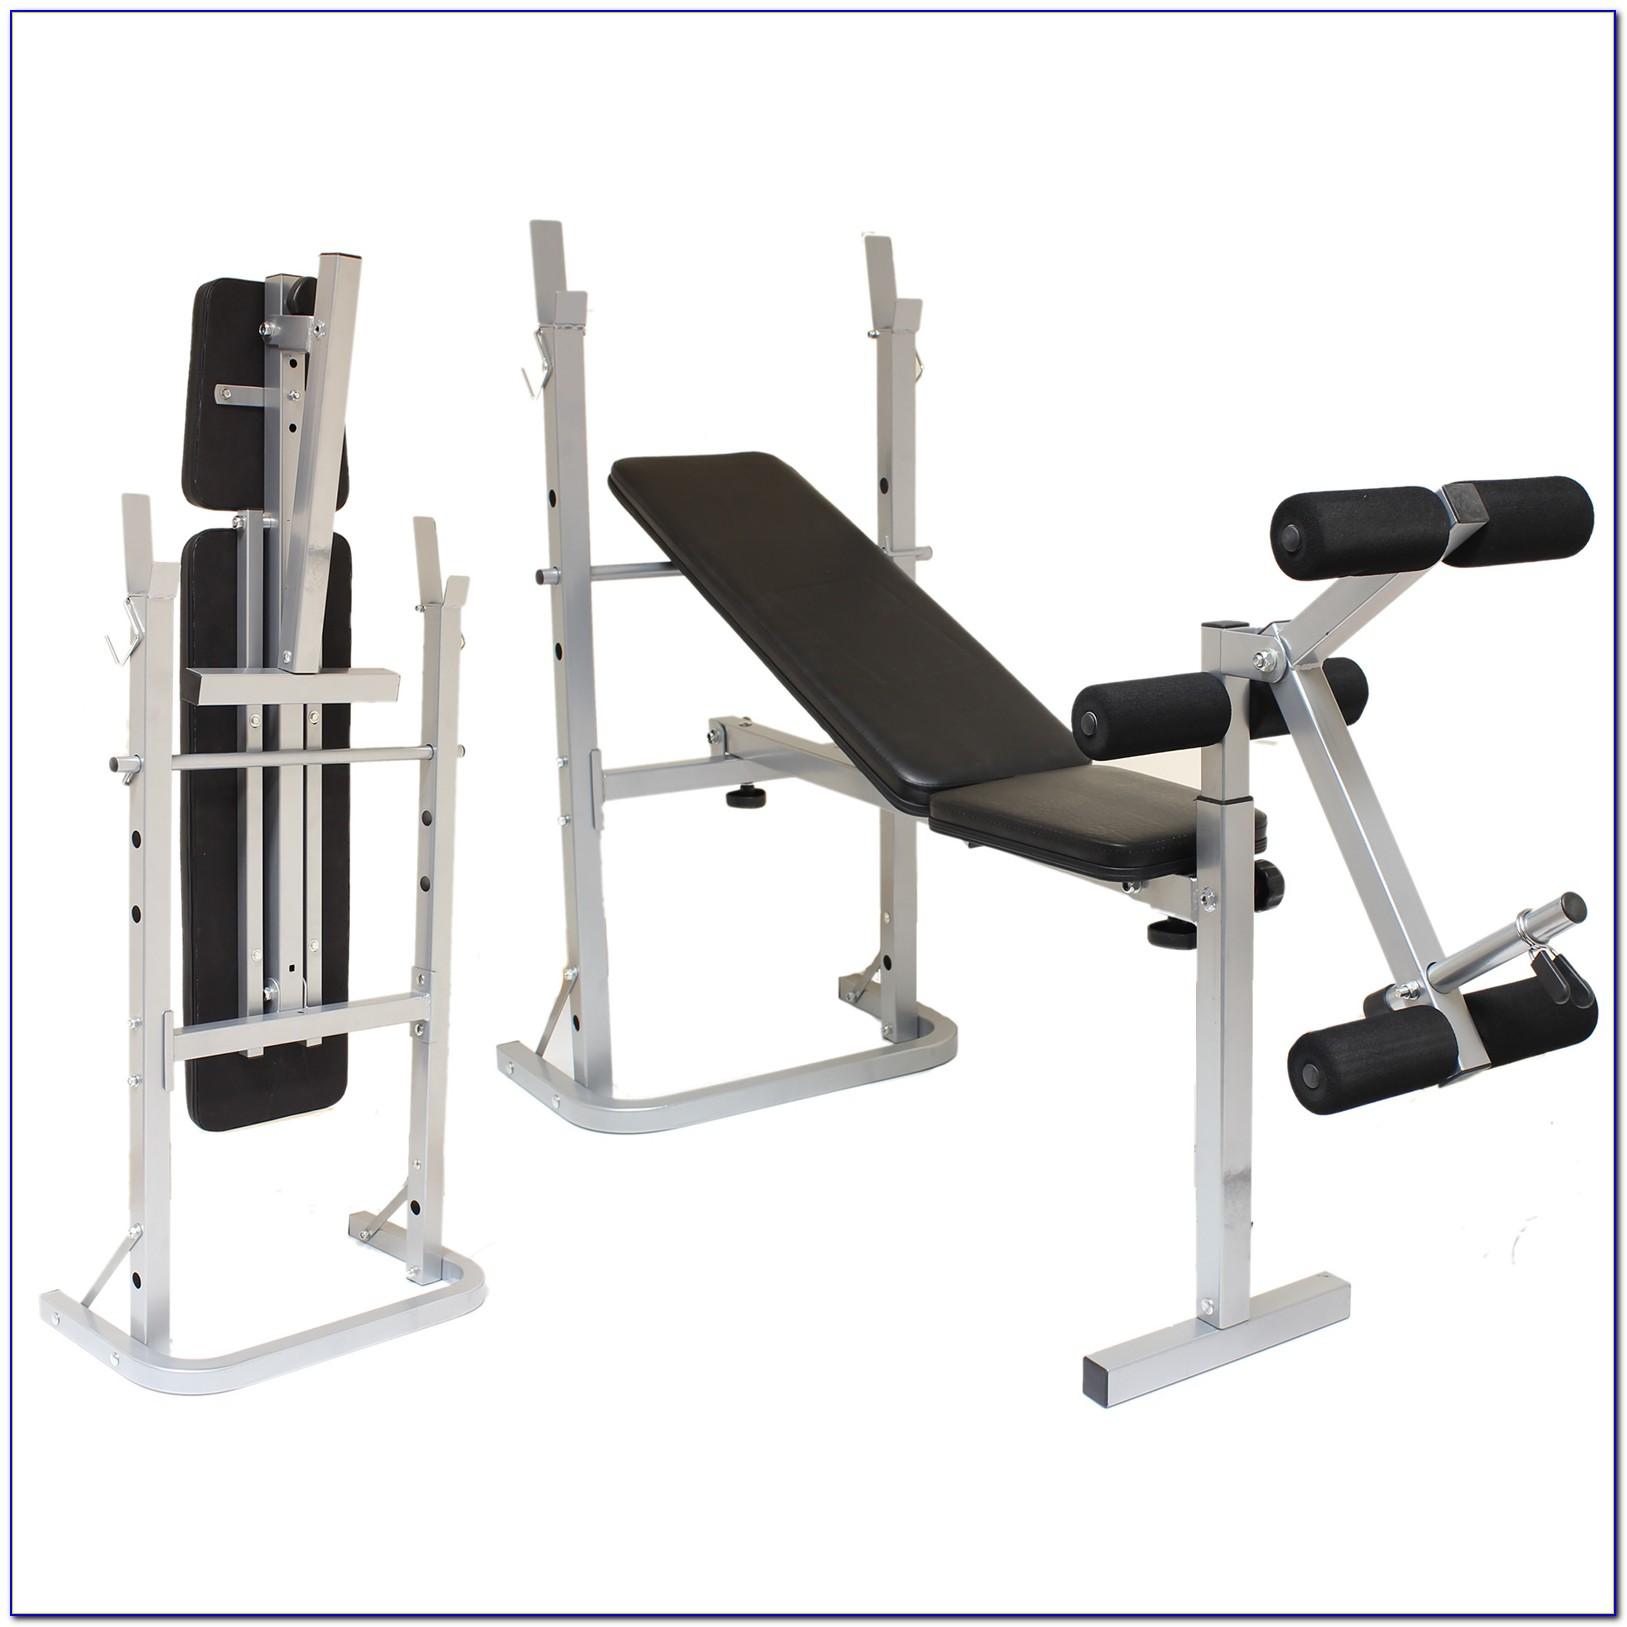 Fold Away Weight Lifting Bench